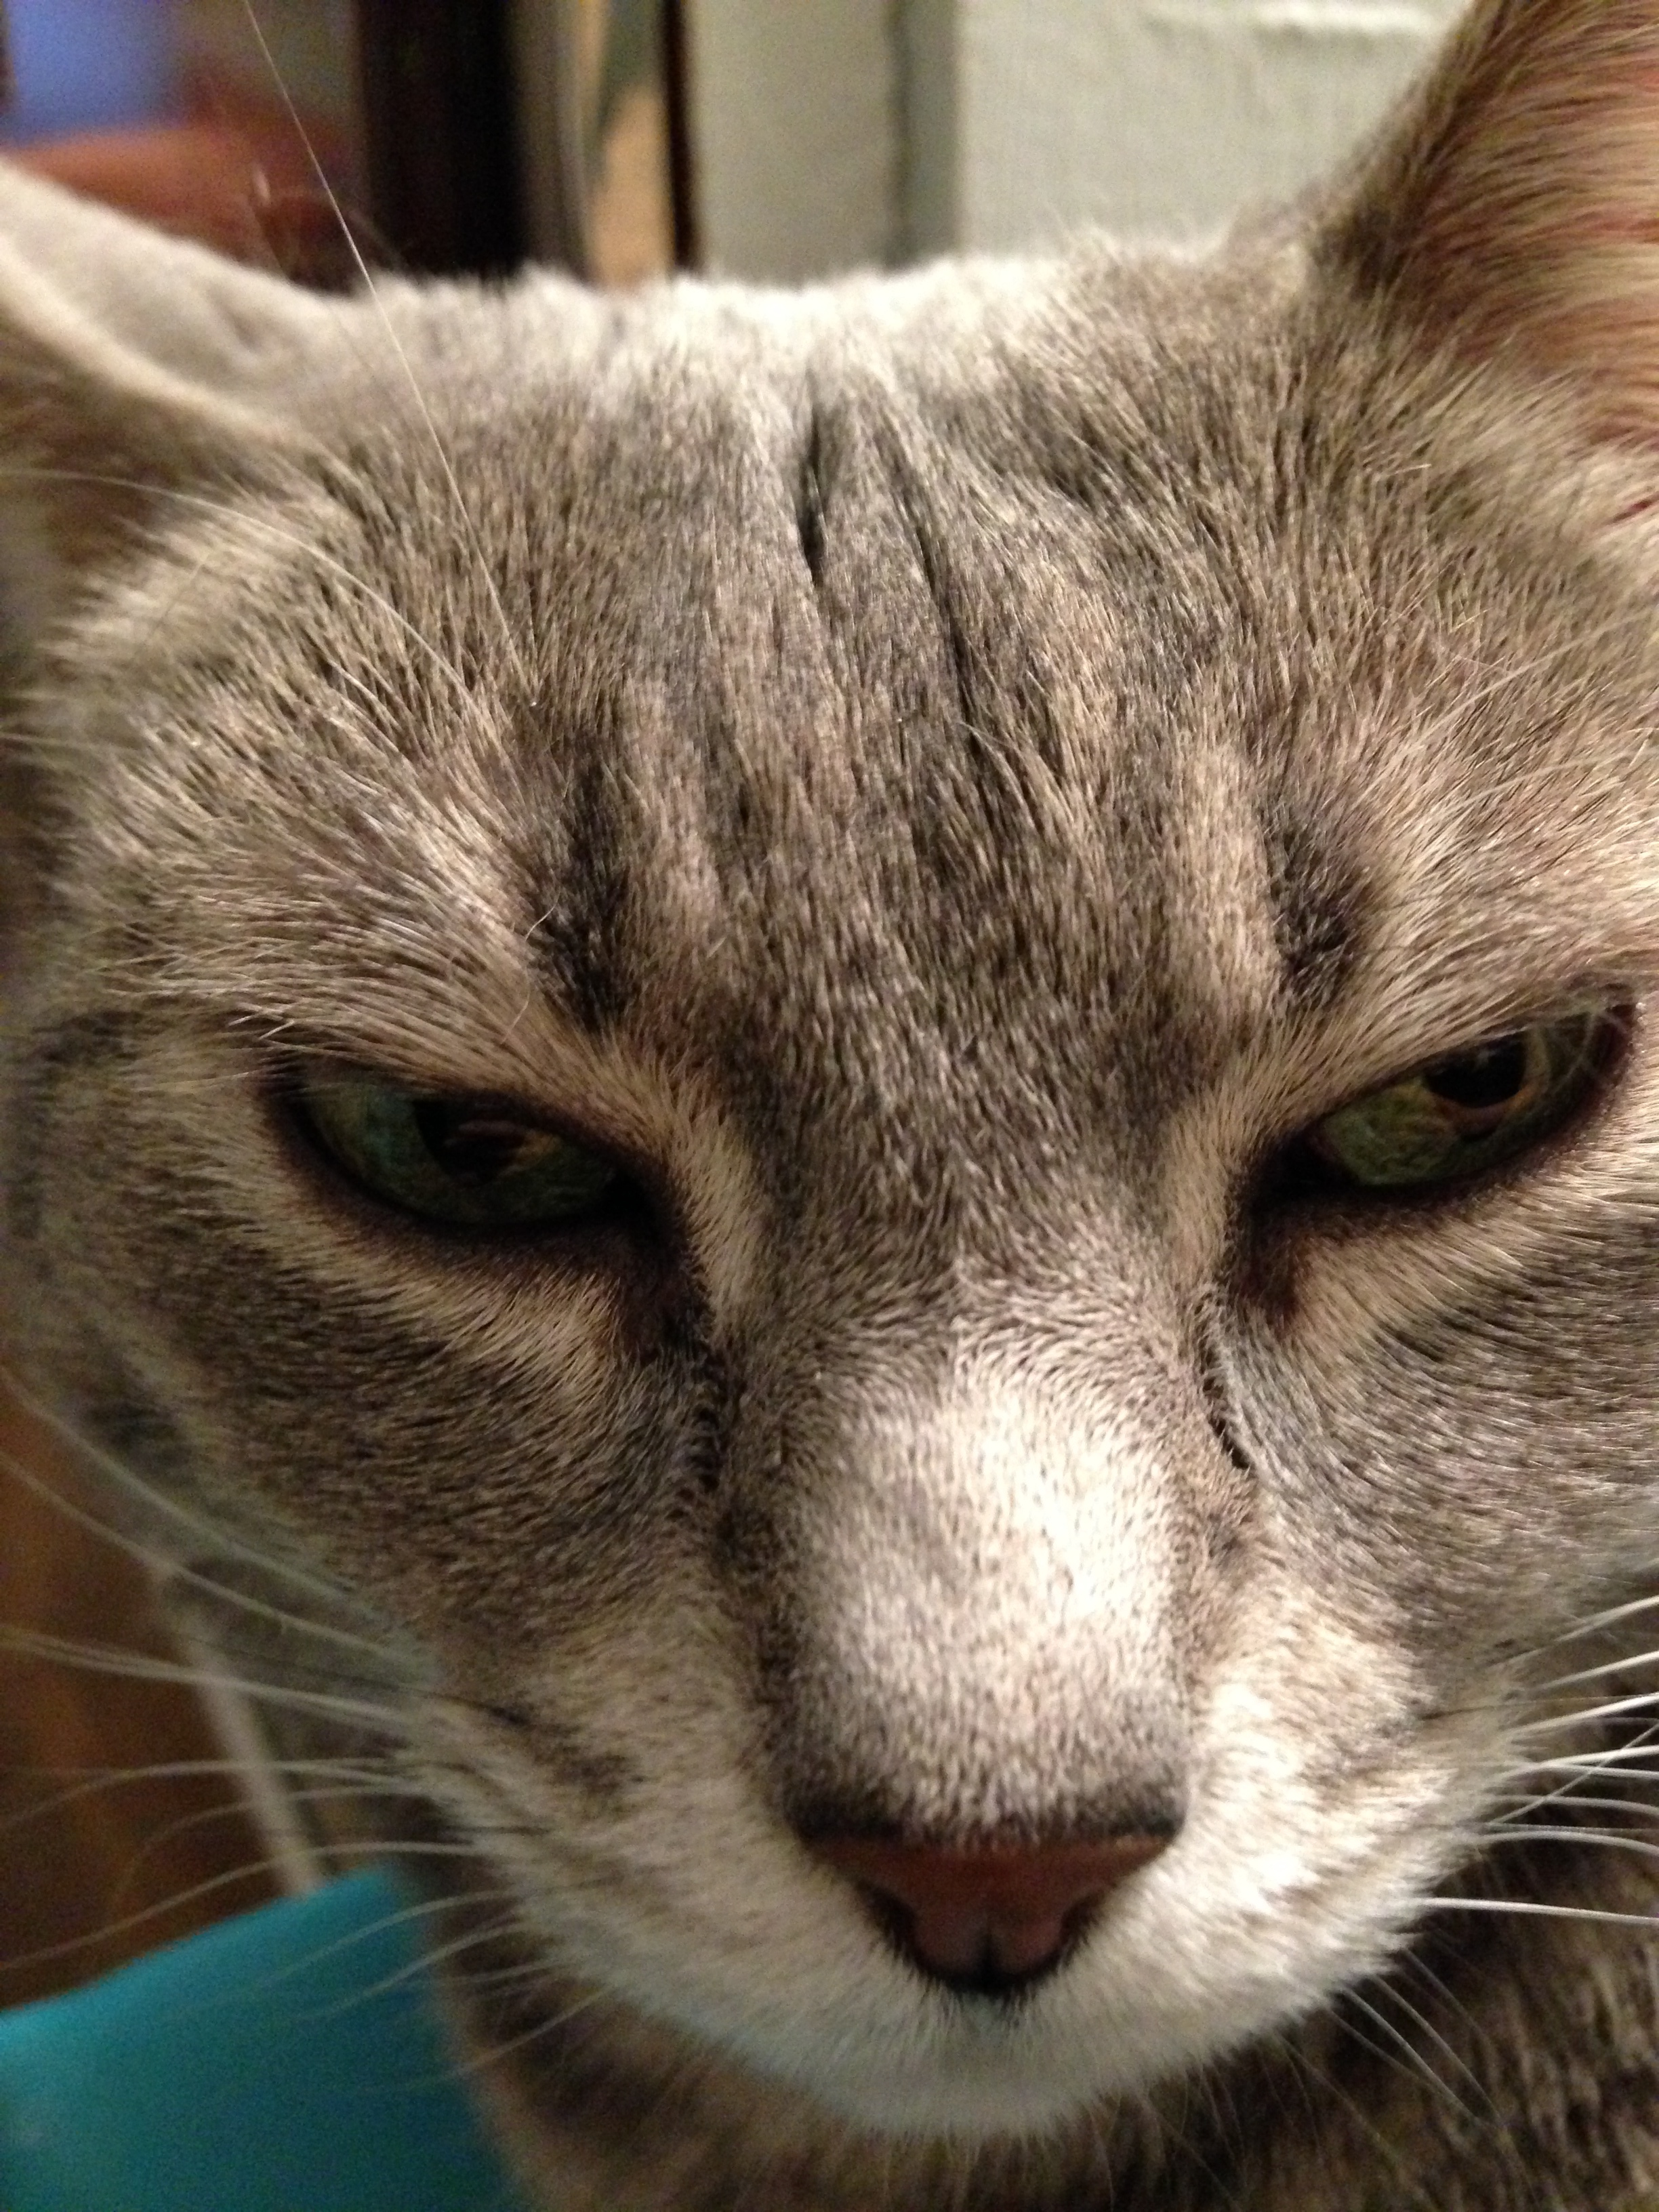 whoa cat selfie!